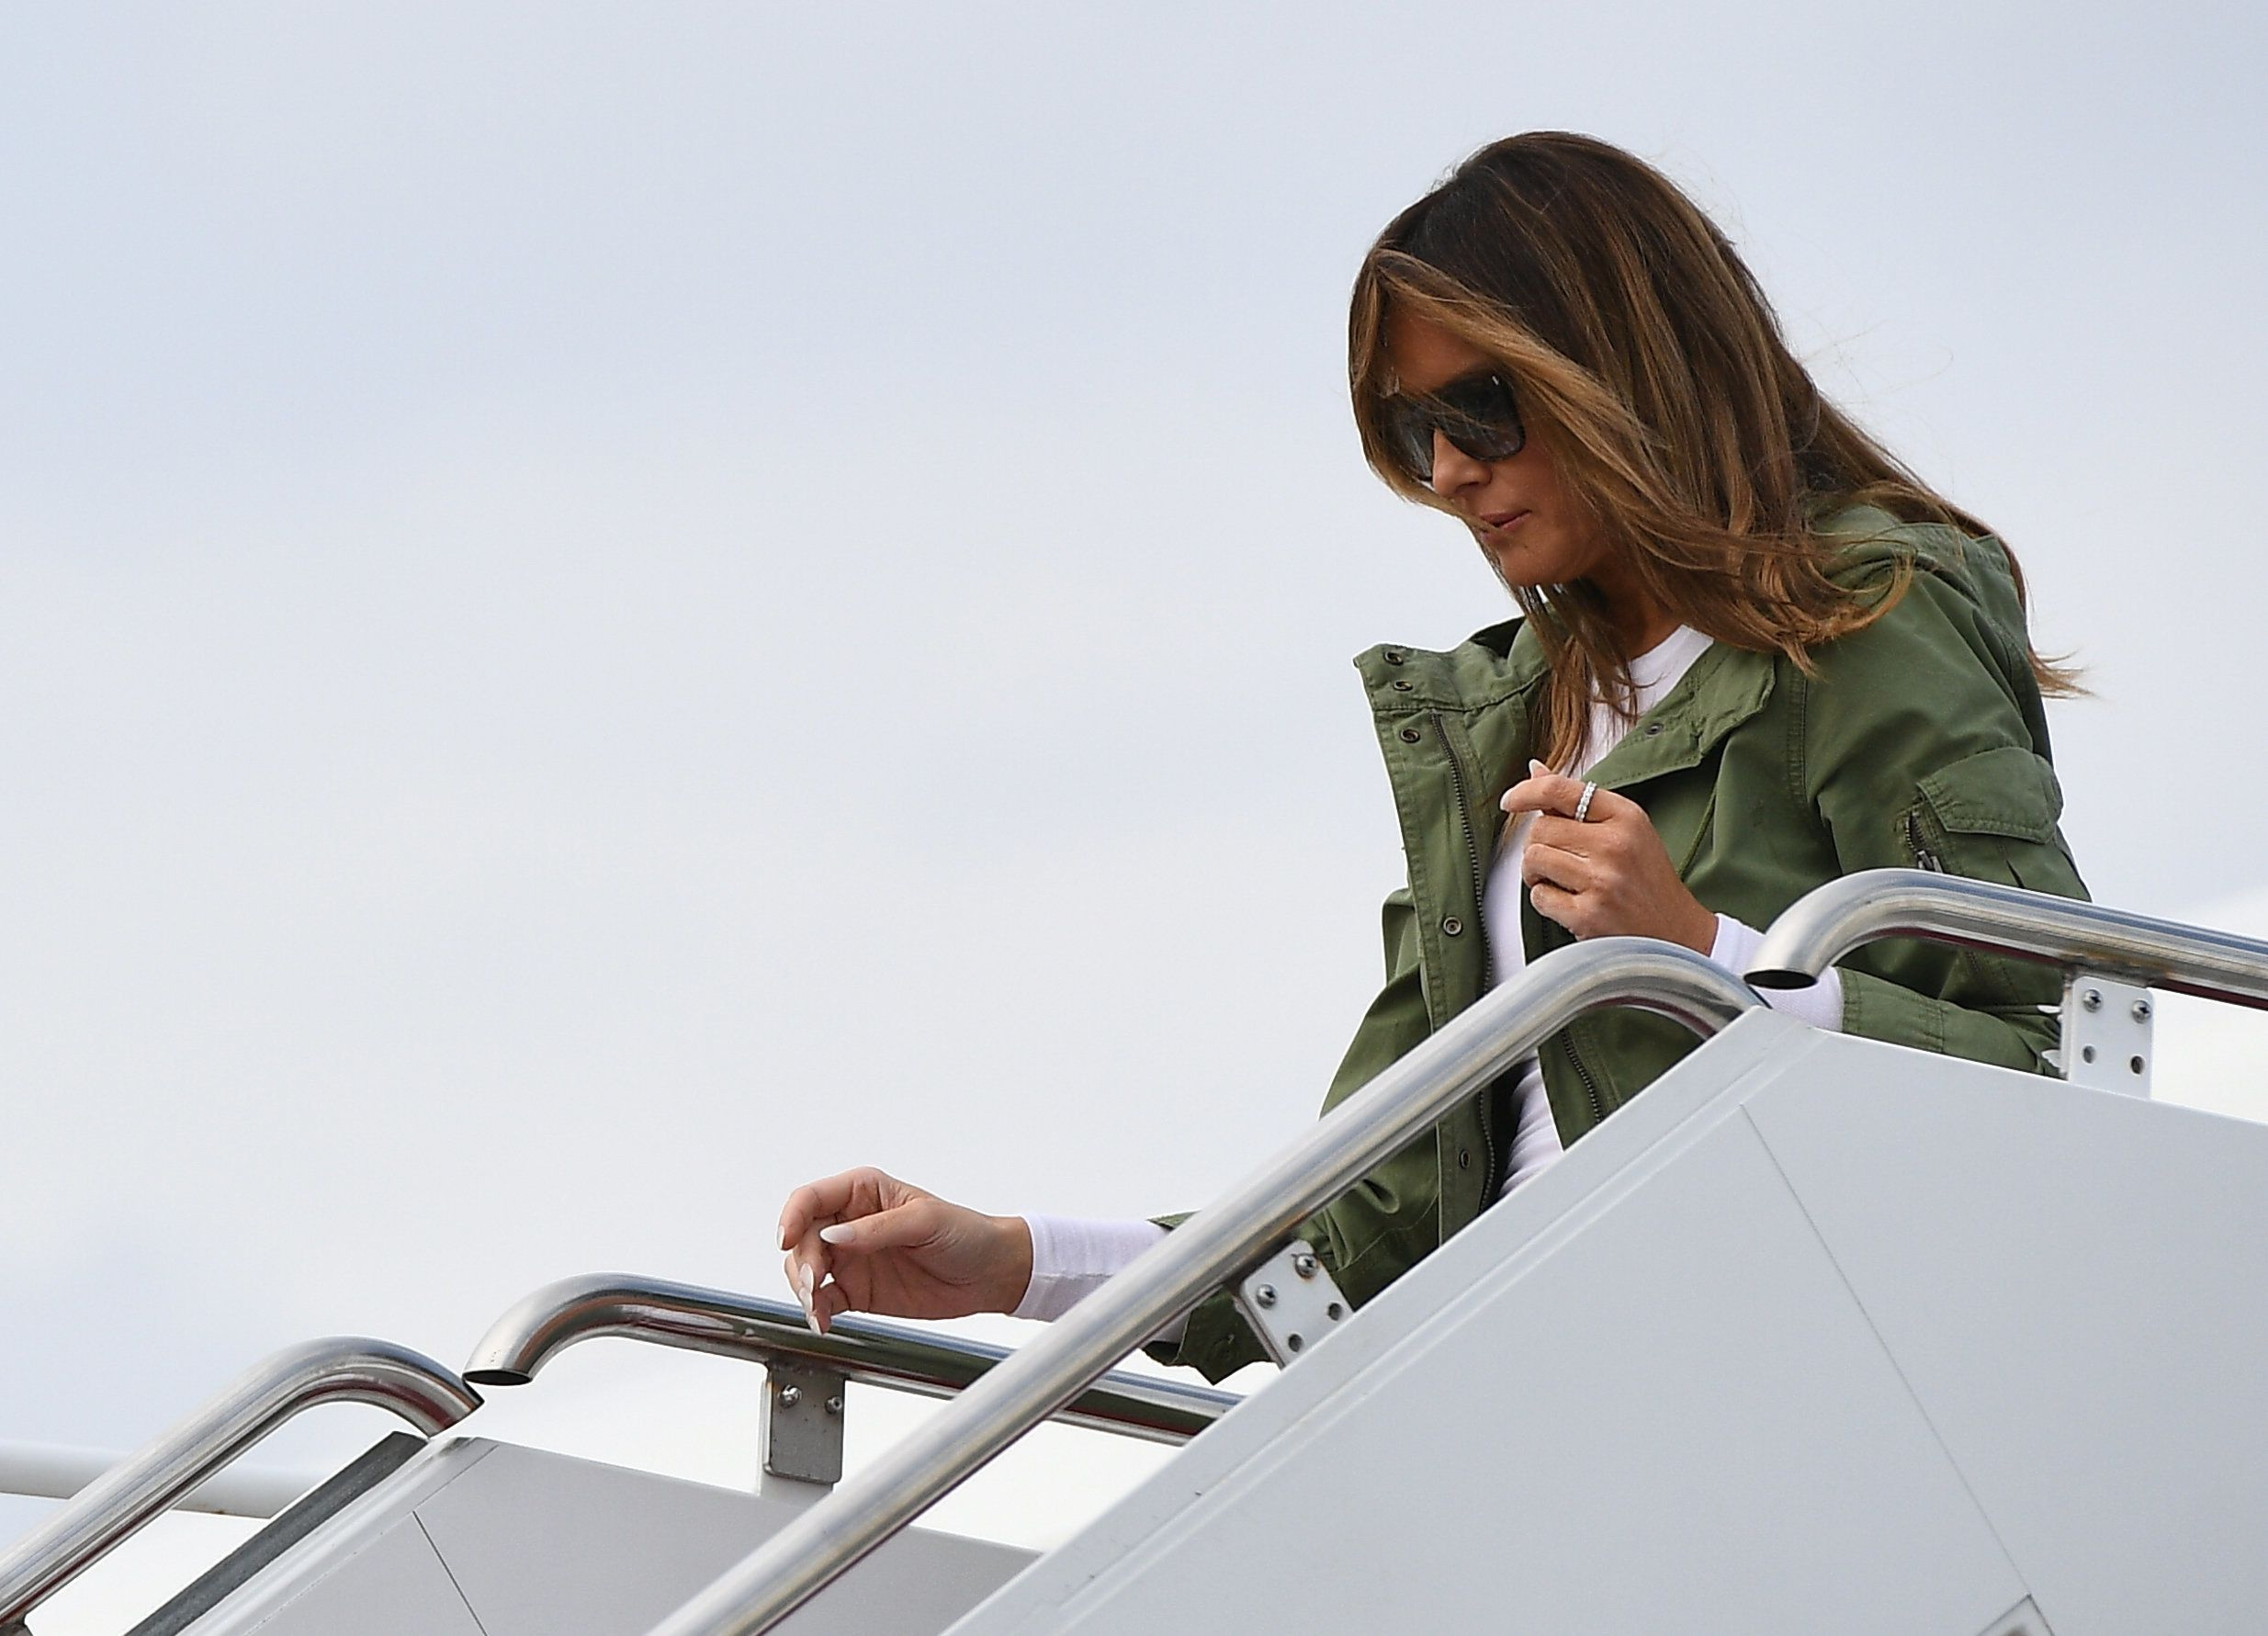 Donald Trump verrät, welche Botschaft wirklich hinter Melanias Jacke steckt